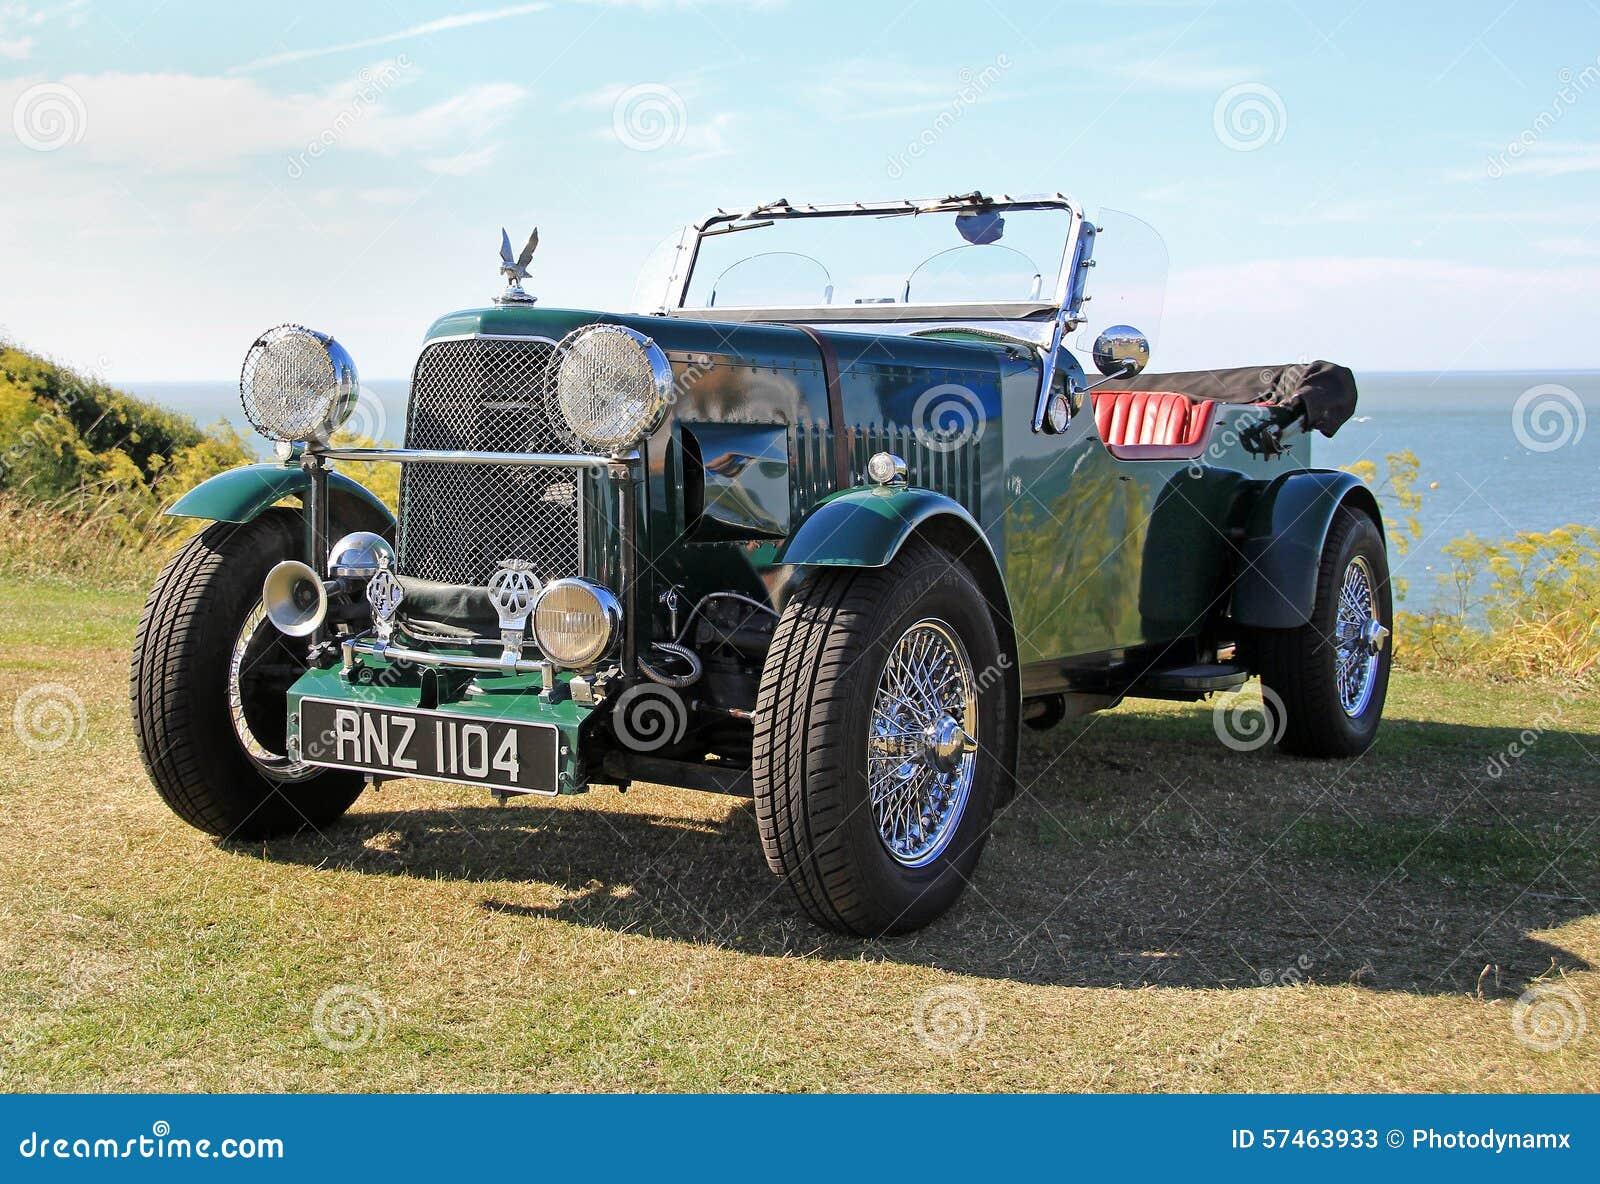 Vintage convertible mg car editorial stock photo. Image of 1920 ...